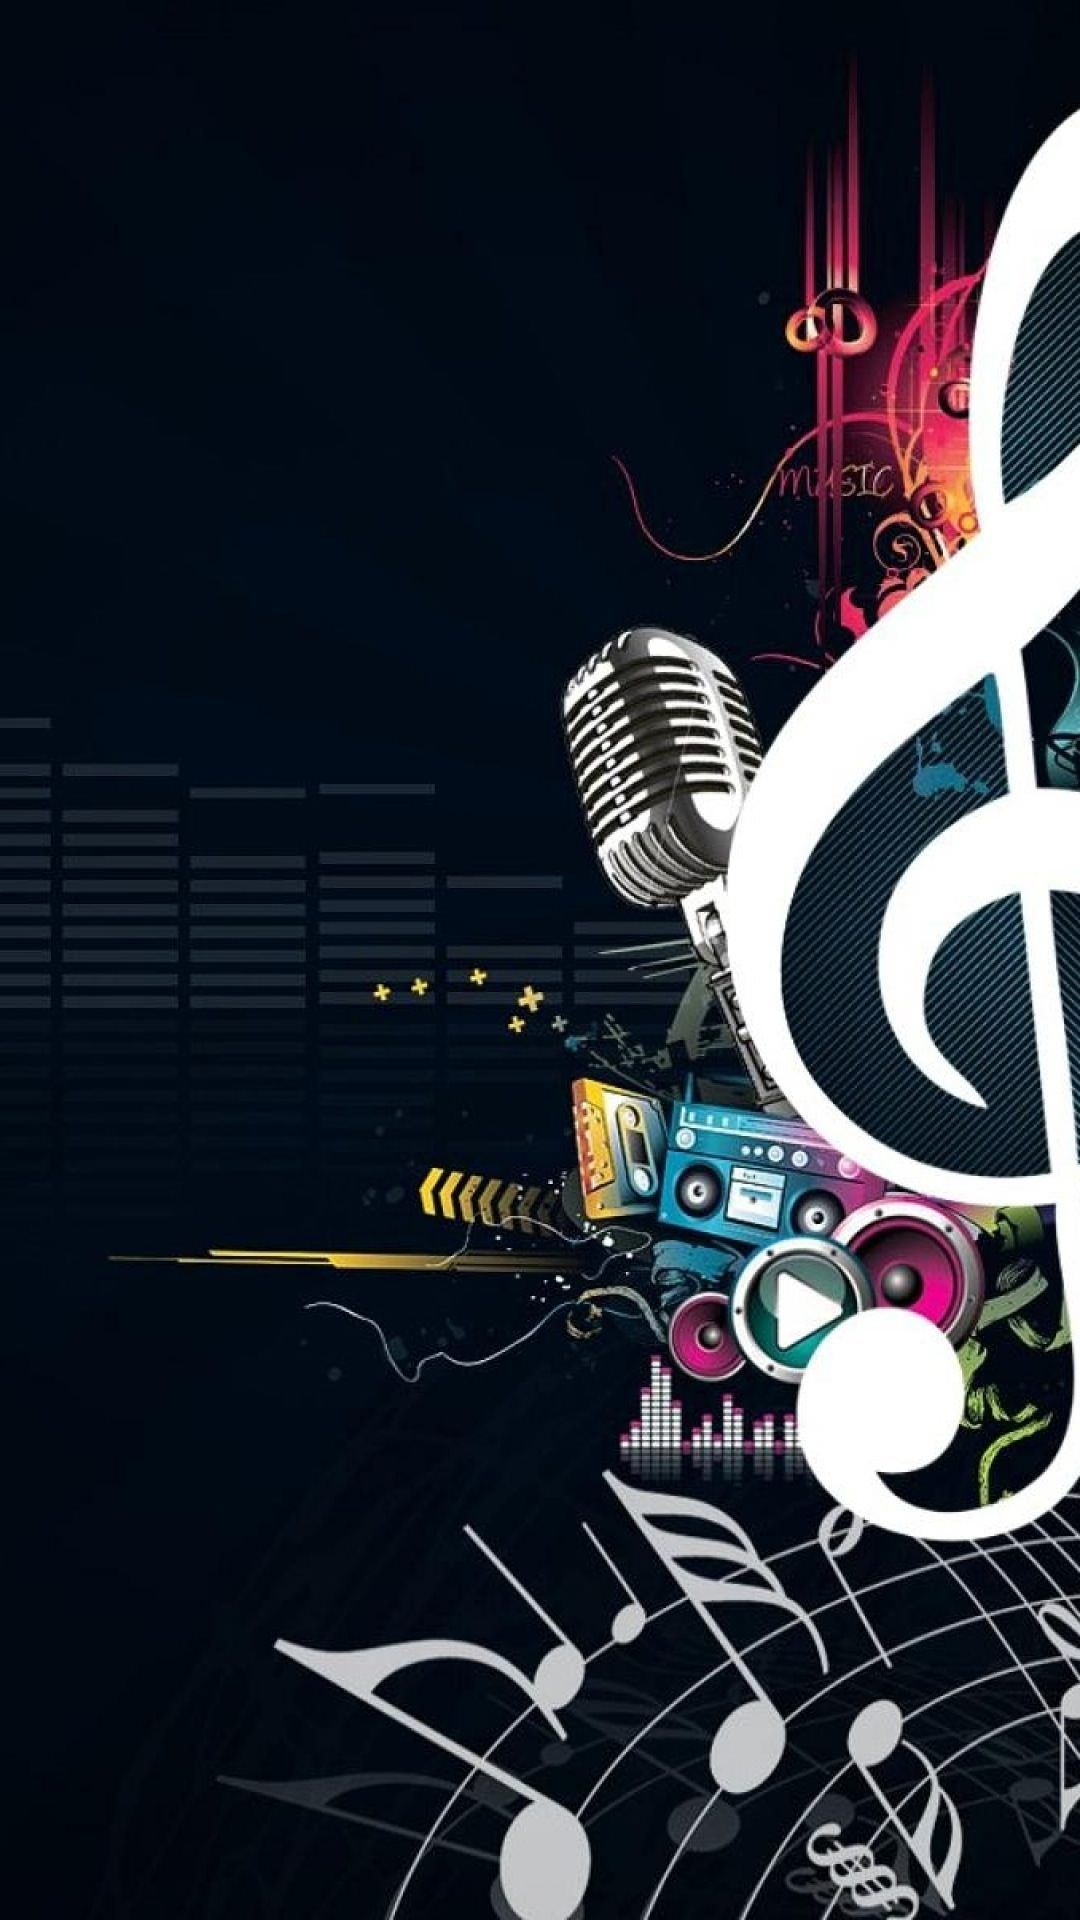 Cool Wallpaper High Resolution Hupages Download Iphone Wallpapers Iphone Wallpaper Music Music Wallpaper Music Artwork